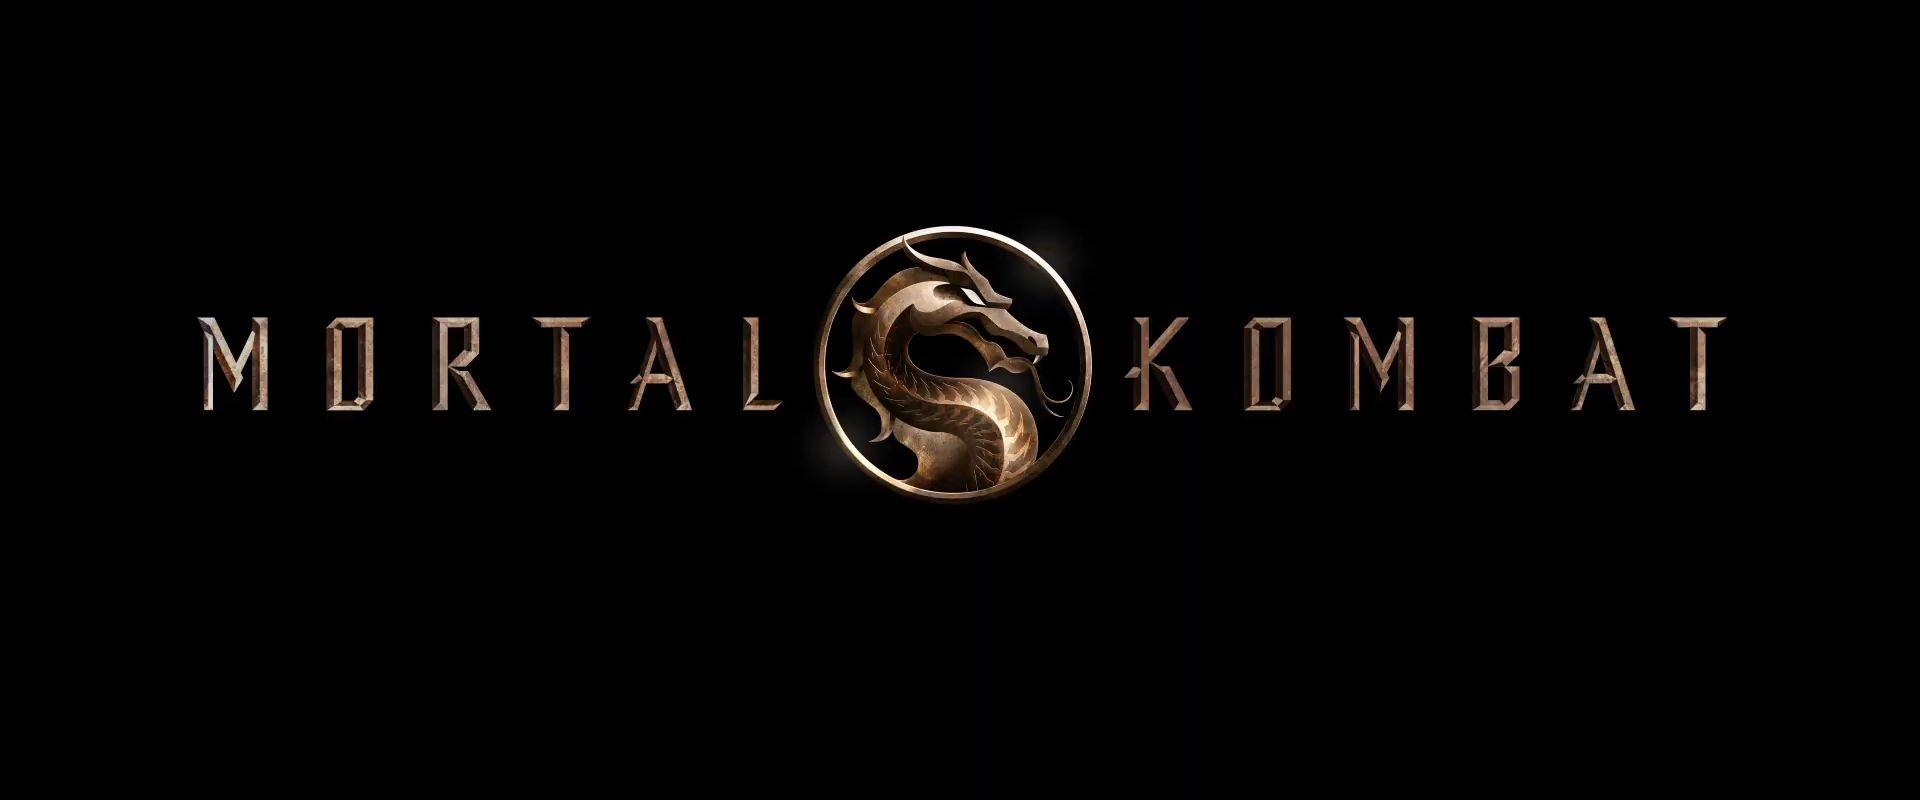 Mortal Kombat HBO Max